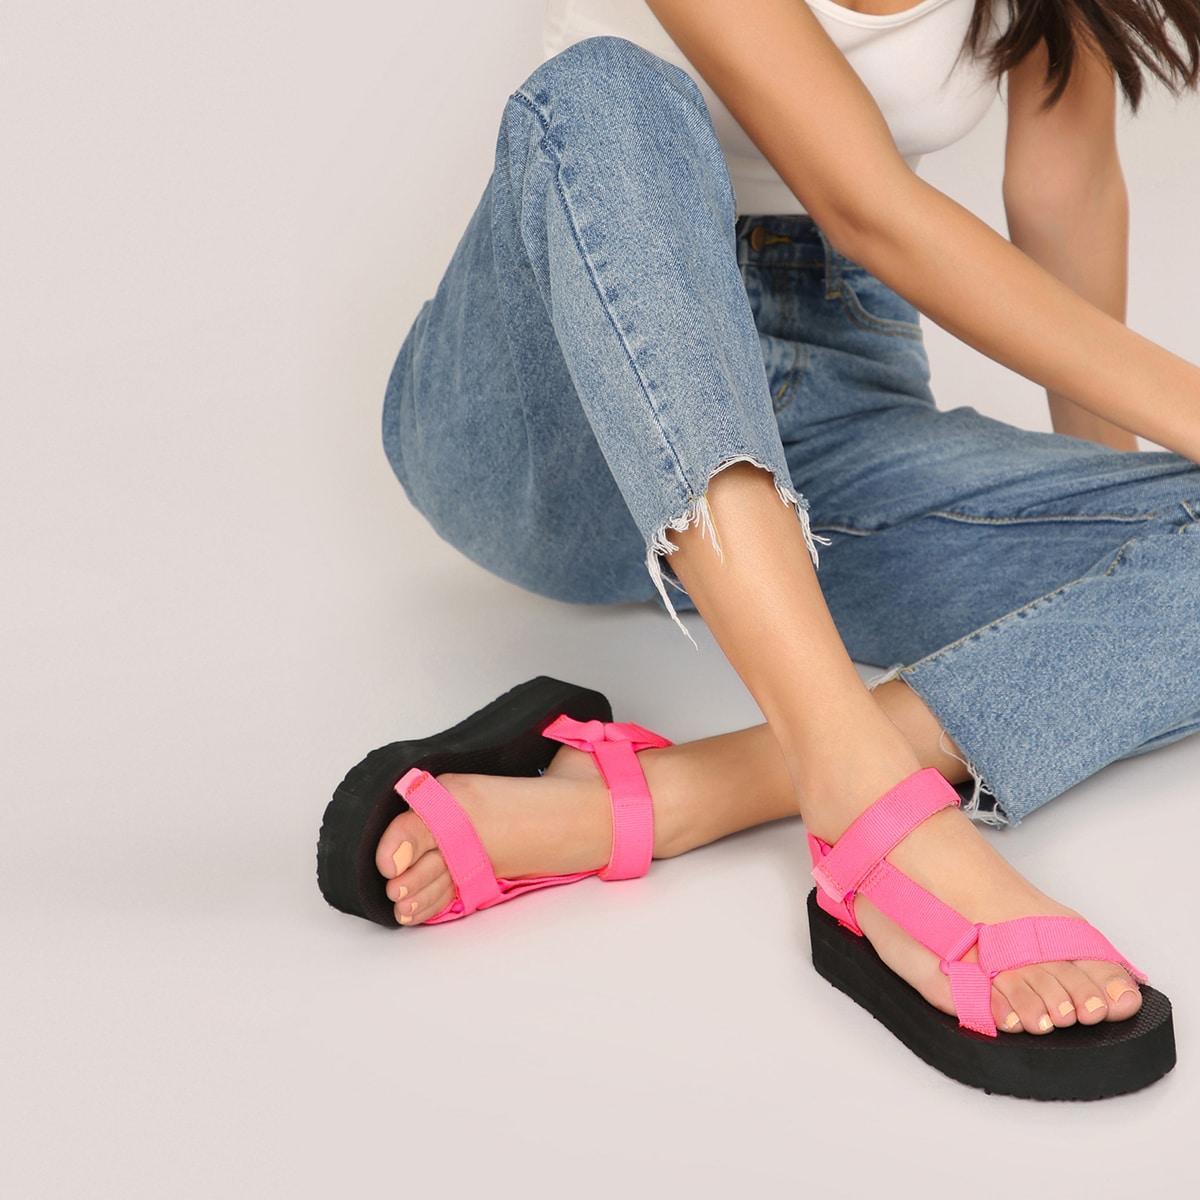 Неоновые сандалии на платформе с двумя ремешками на липучках по цене 926